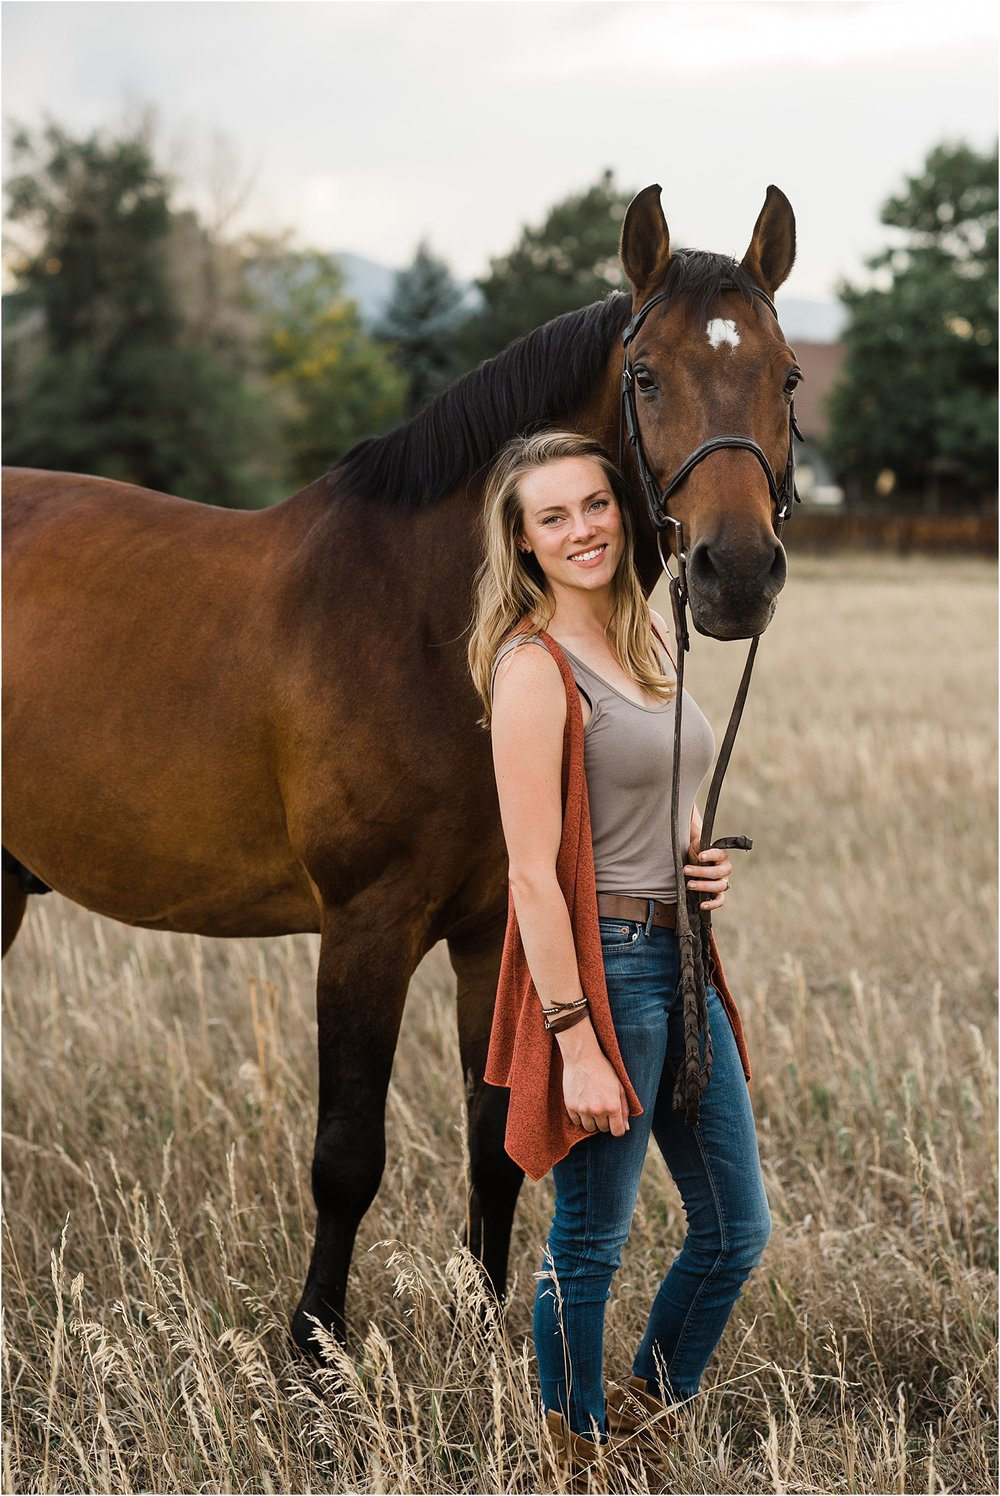 Limbo_Blog_Stomp_Horse_Photography_Equine_Warmblood_Portraits_019.jpg